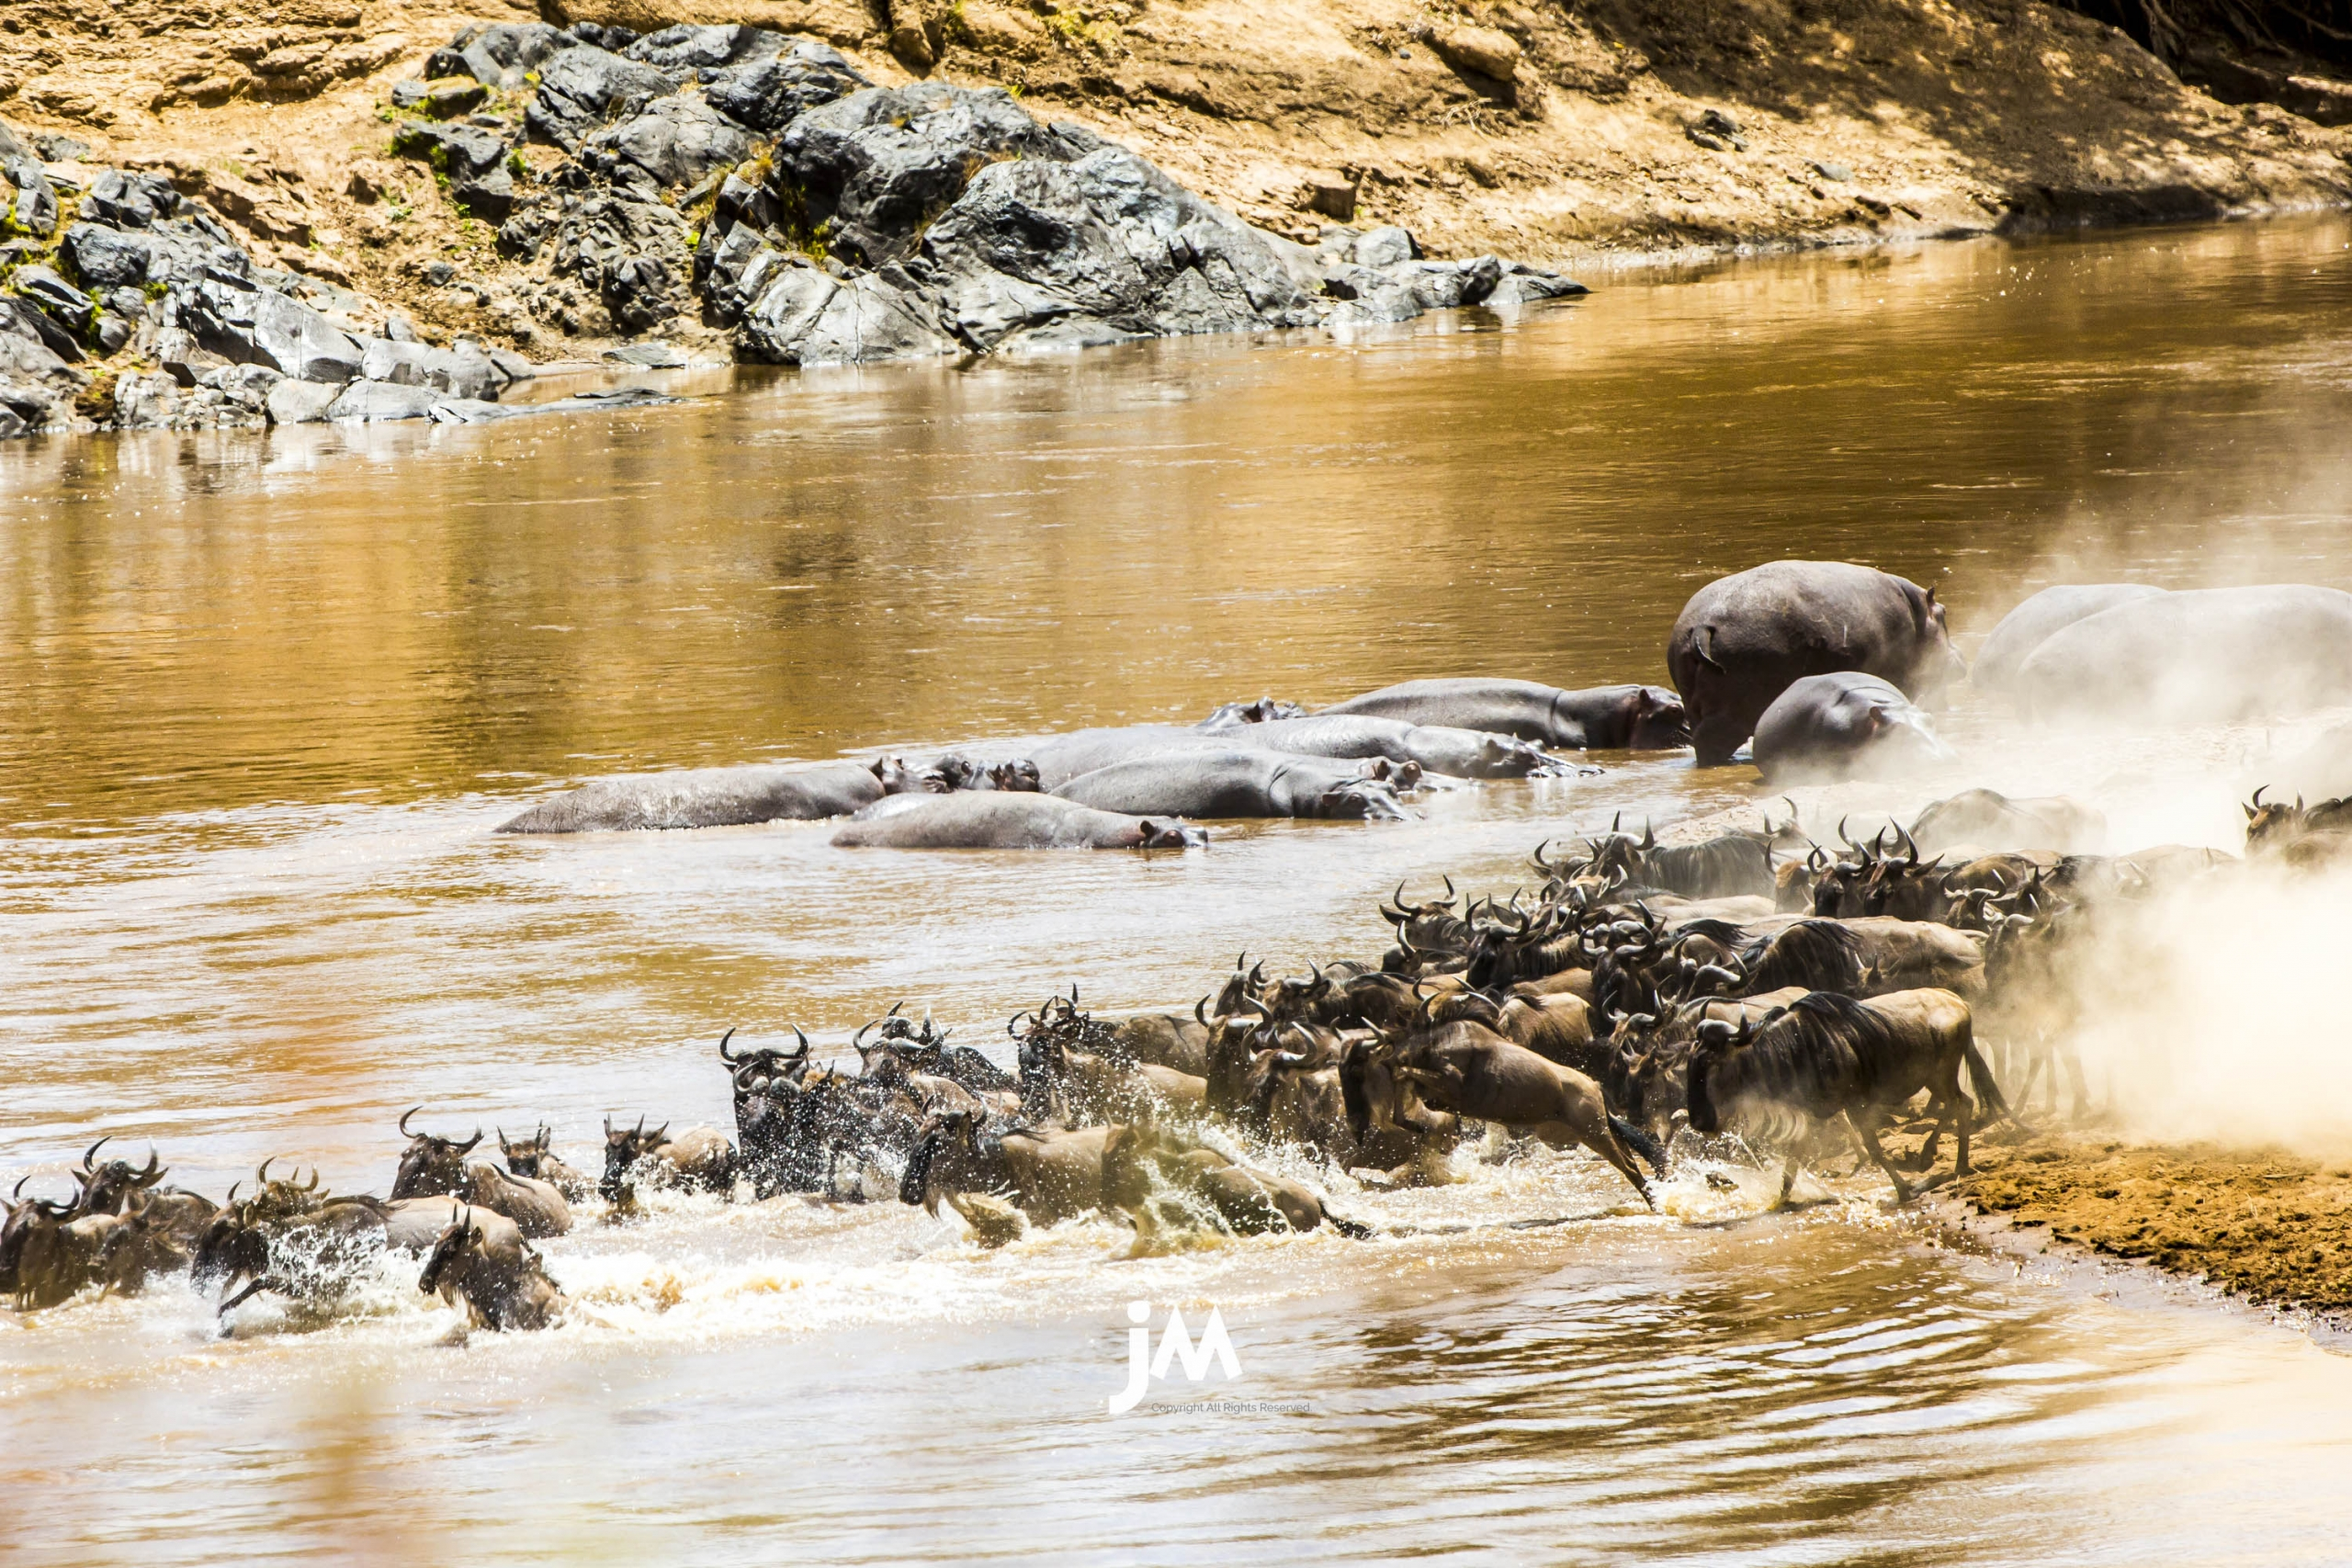 Kenya, Masai Mara Safari Photo Tour